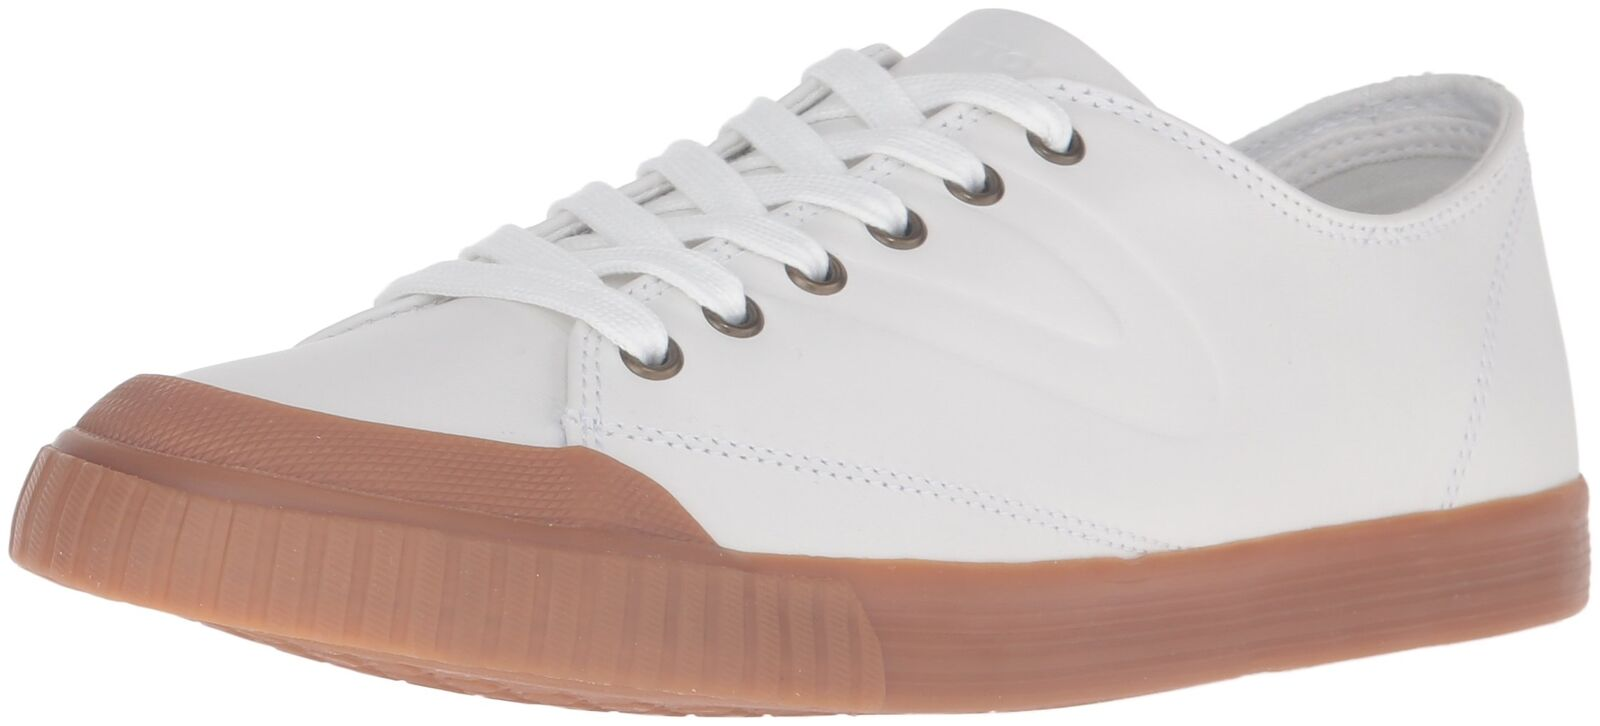 Tretorn Women's Marley2 Fashion Sneaker White Honey 10 B(M) US